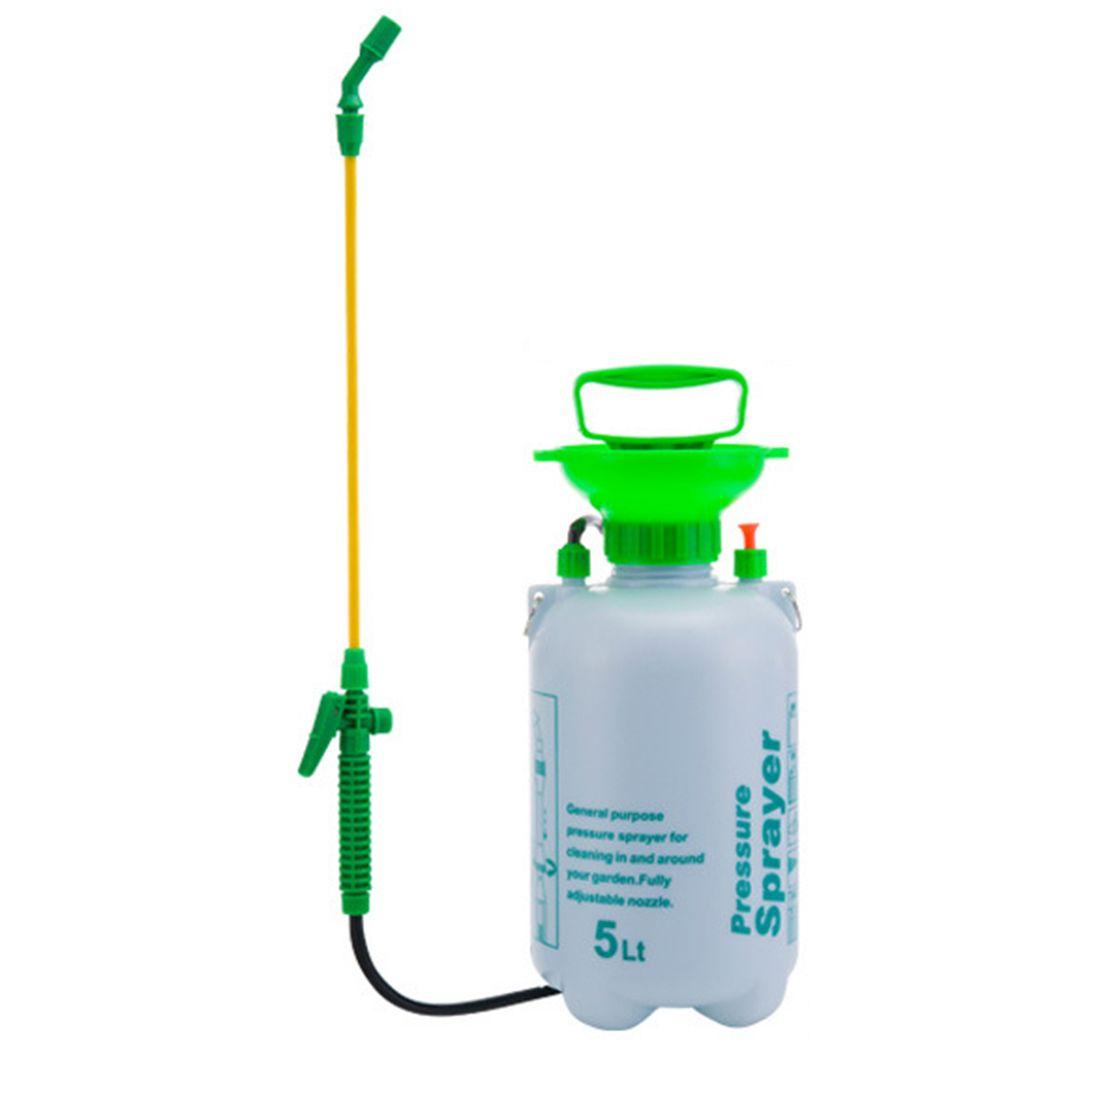 5L Plastic Agricultural Pesticide Spraying Sprayer Shouder Type Sprayer Garden Tool - White + Green